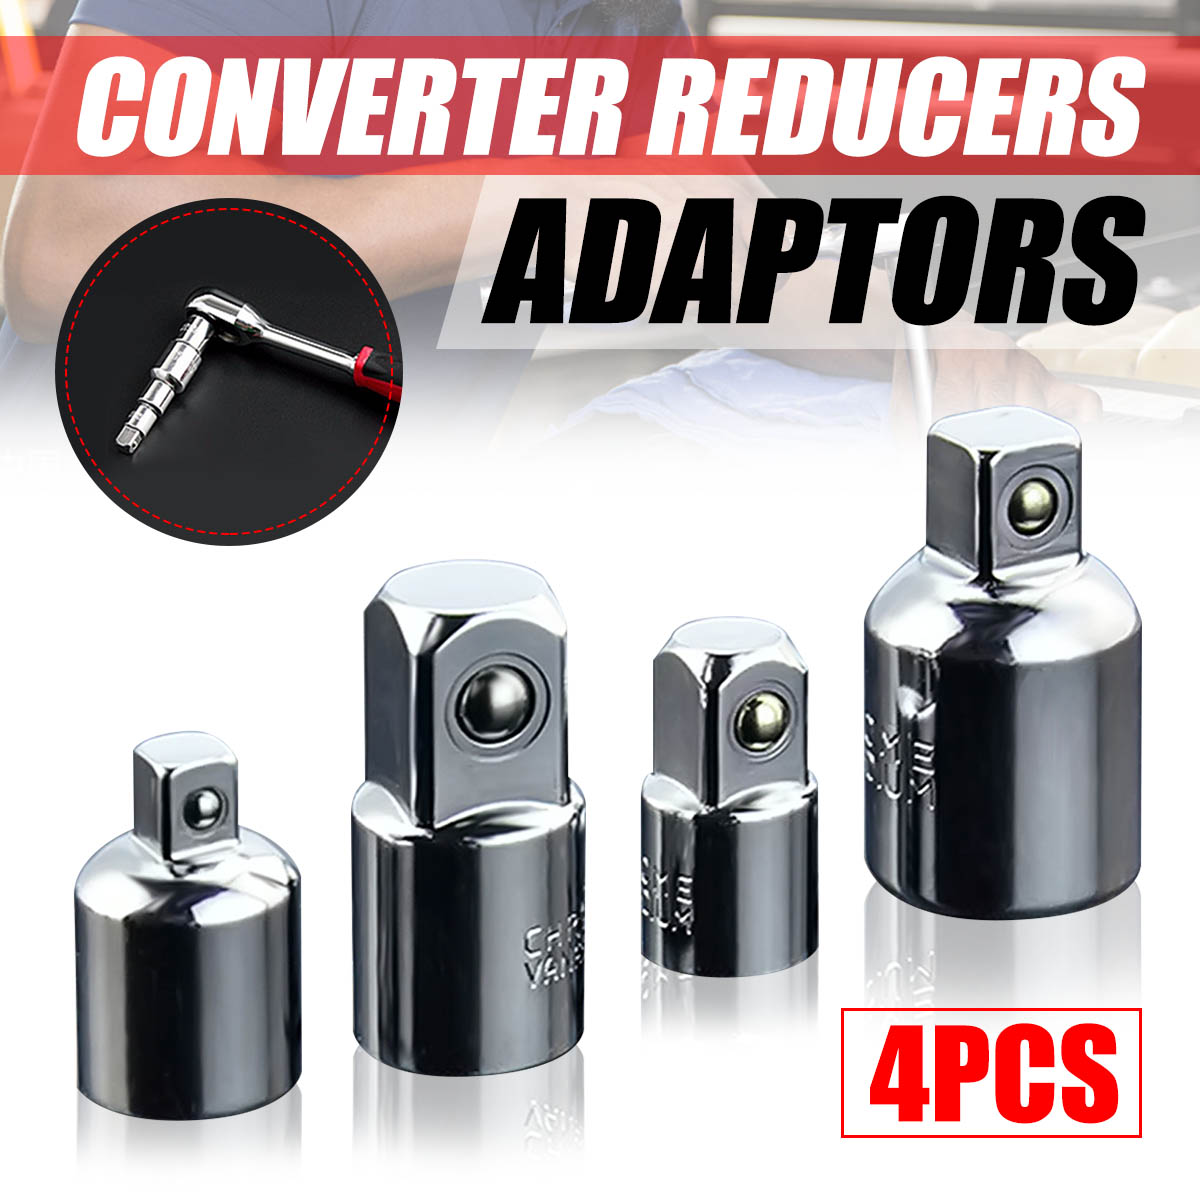 Drillpro 4pcs Socket Ratchet Converter Reducers Adaptors 1/2 3/8 1/4 inch Set High Quality Chrome Vanadium SteelDrillpro 4pcs Socket Ratchet Converter Reducers Adaptors 1/2 3/8 1/4 inch Set High Quality Chrome Vanadium Steel